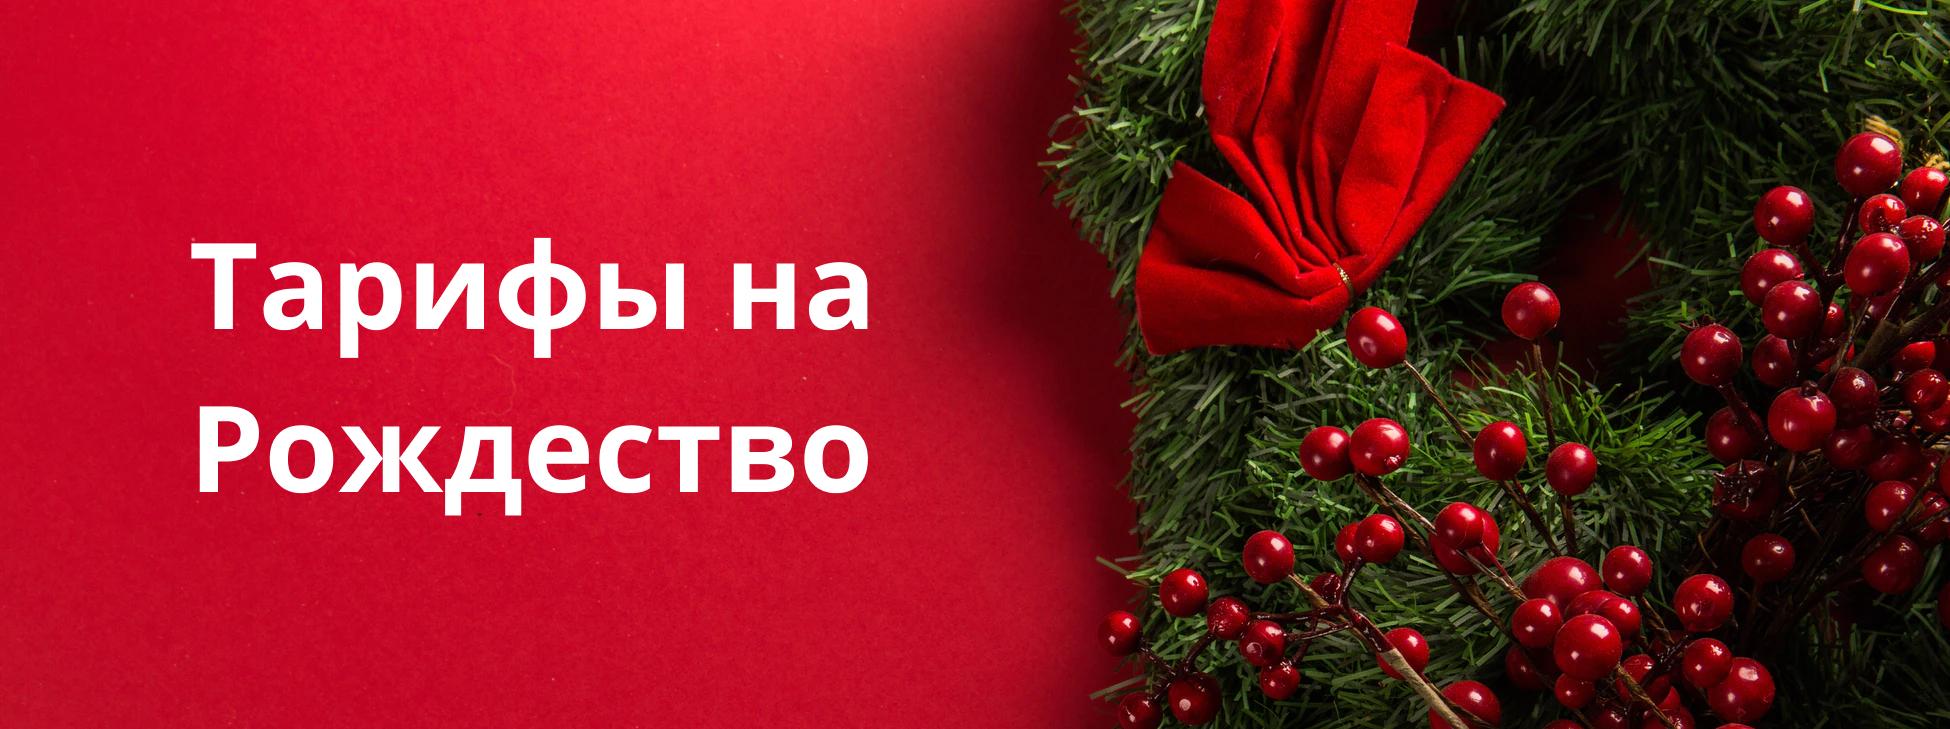 тарифы на рождество